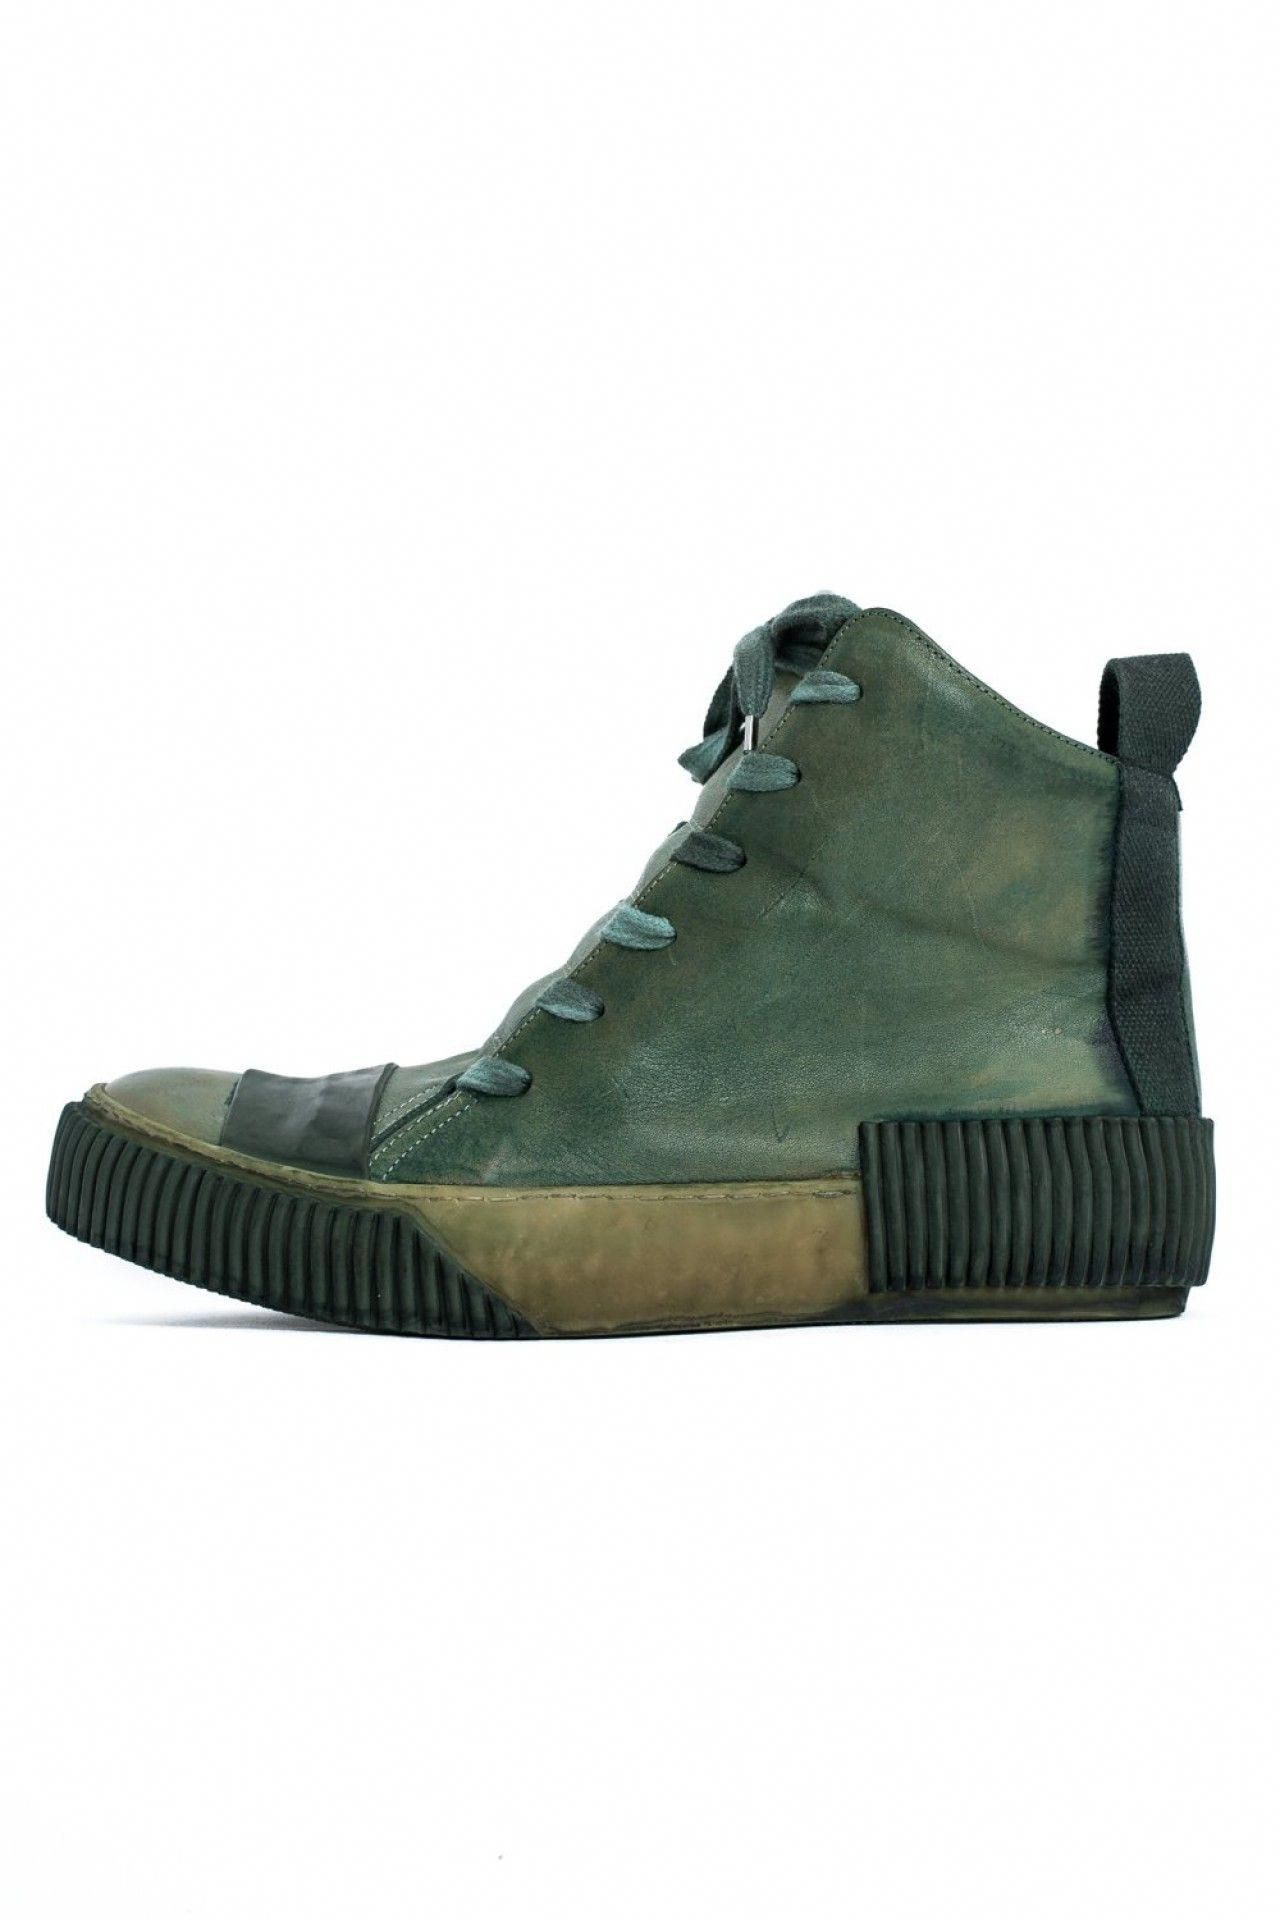 Herren Prada Low Top Sneaker Hoch Stratus Slip On Sneakers